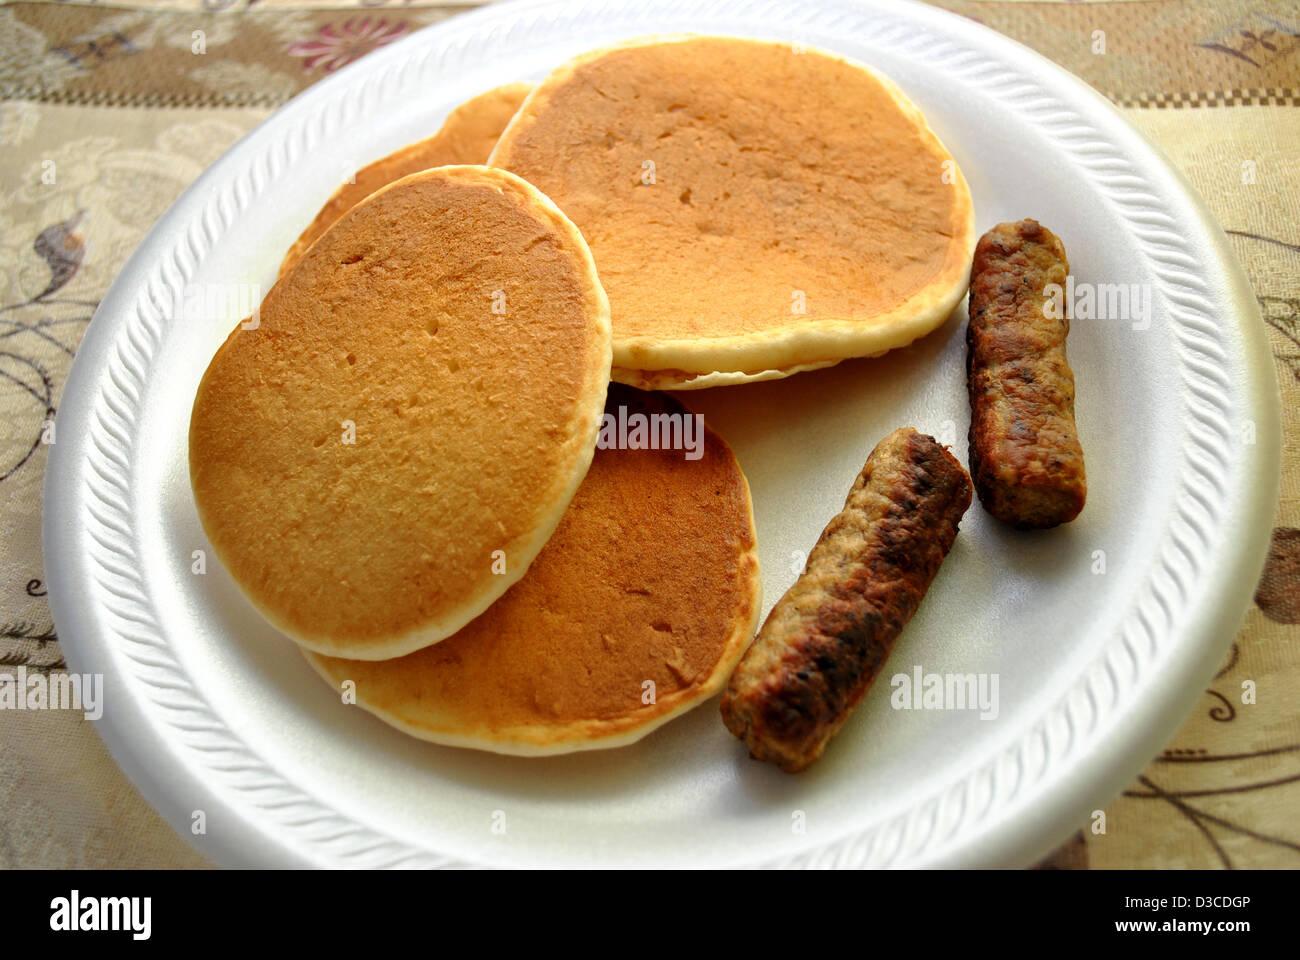 Flap Jacks and Sausage - Stock Image